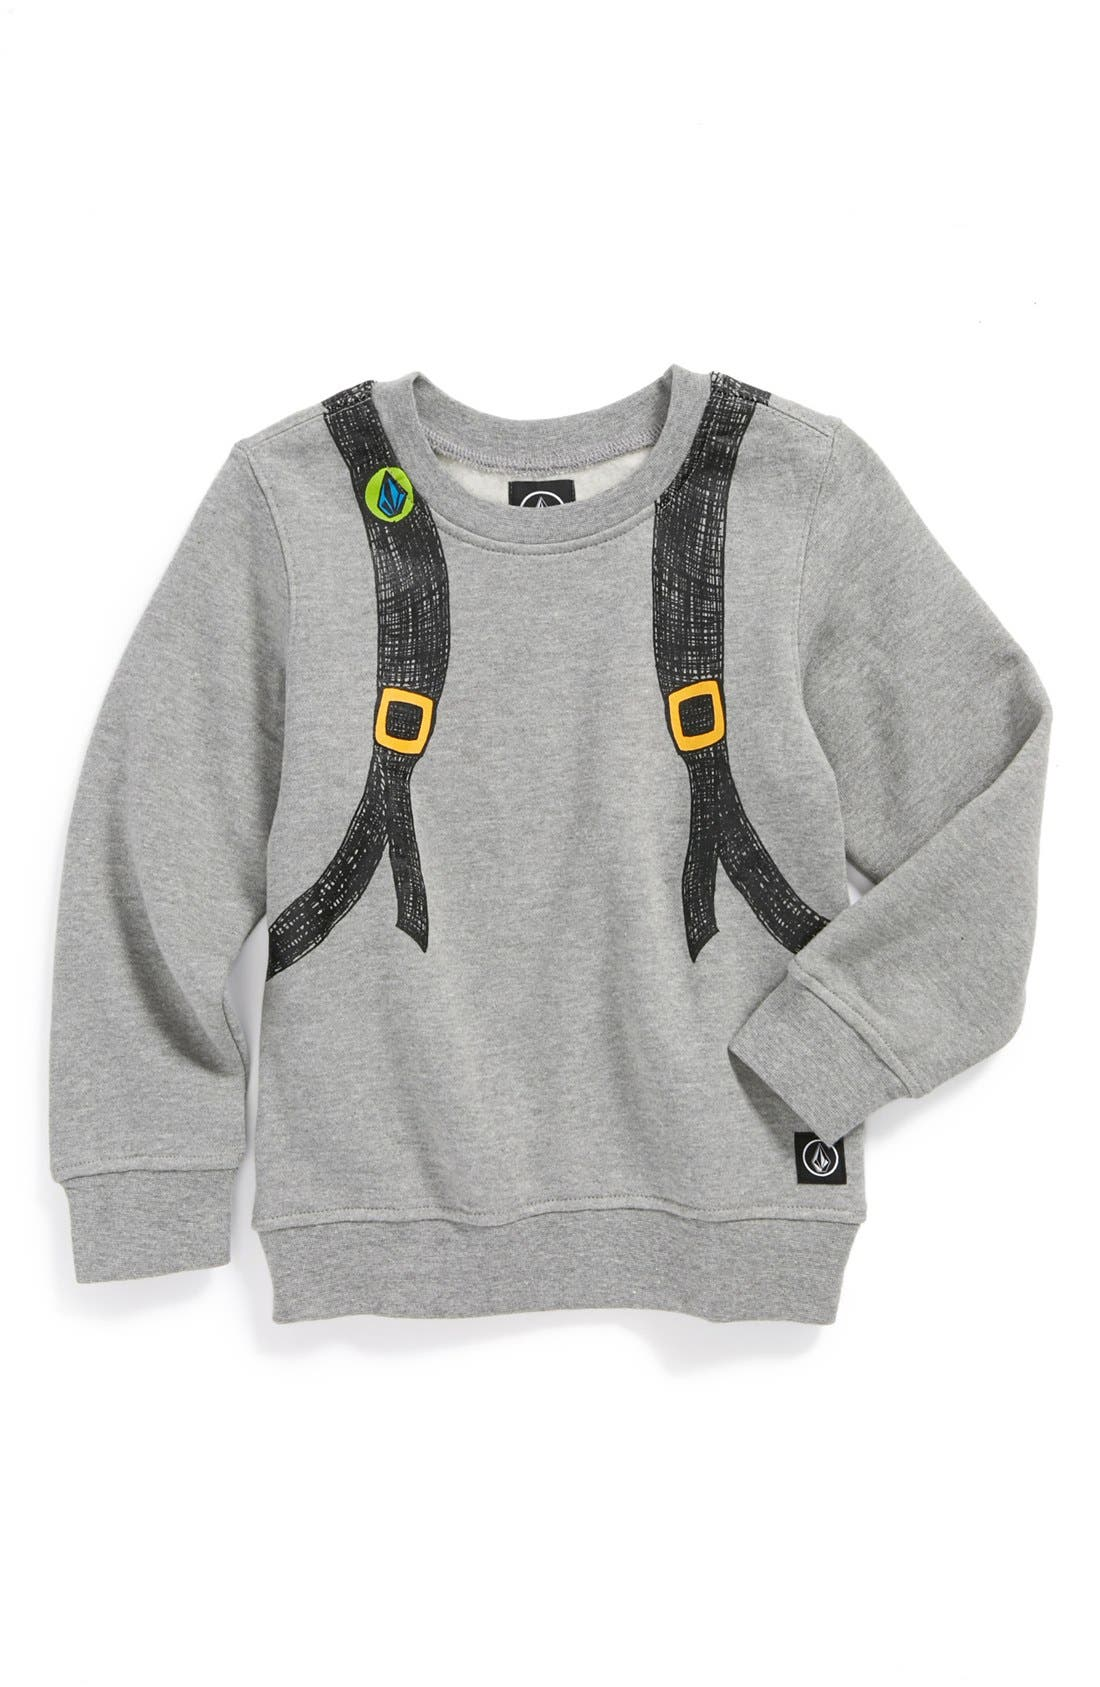 Alternate Image 1 Selected - Volcom 'Reconeryo' Sweatshirt (Little Boys)